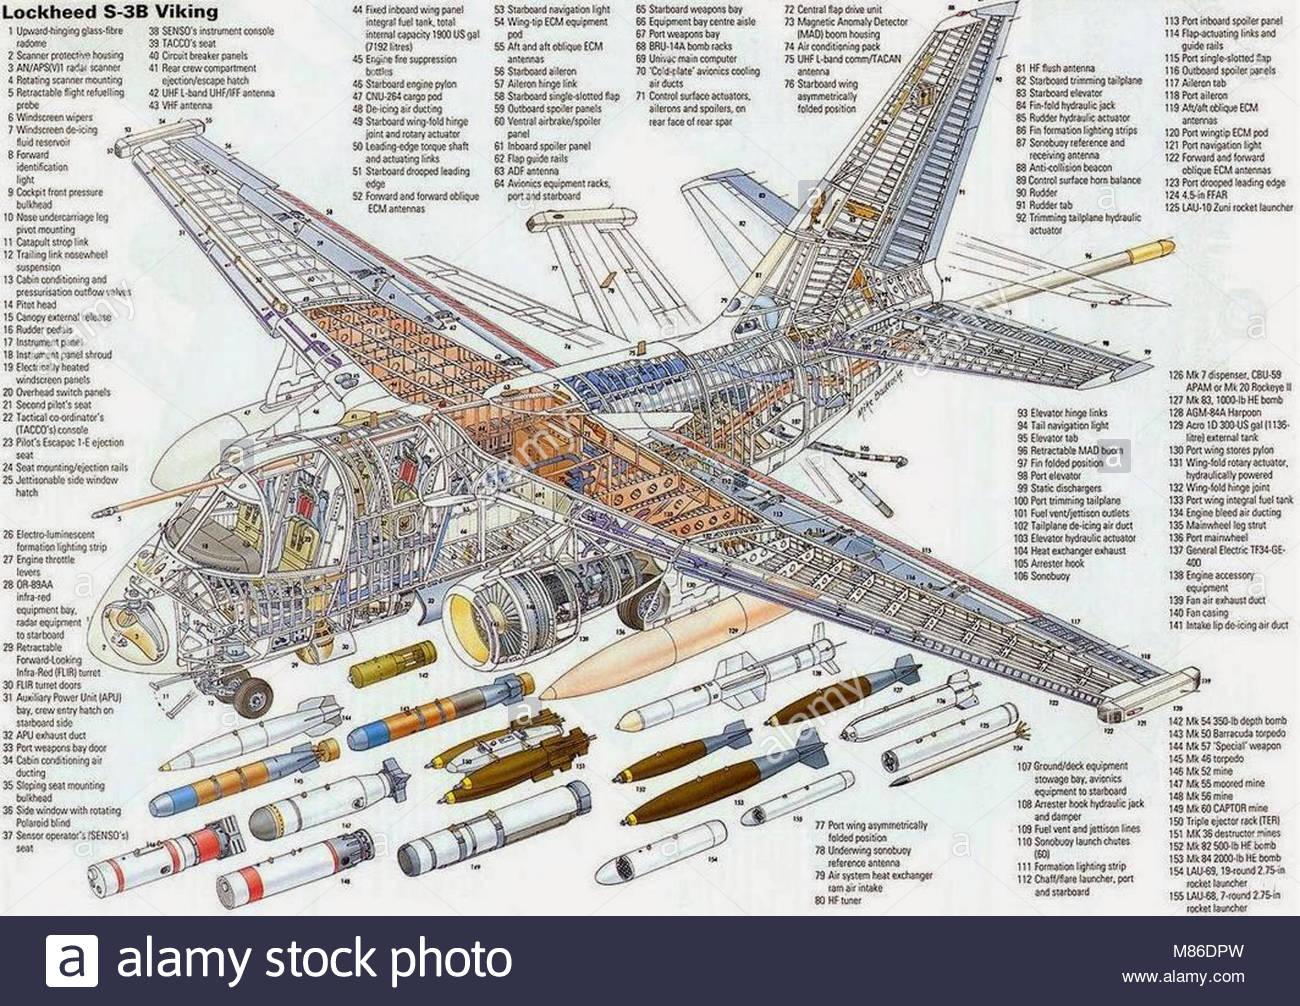 S 3b Viking Stock Photos Images Alamy C 1000b Wiring Diagram For Lockheed Image